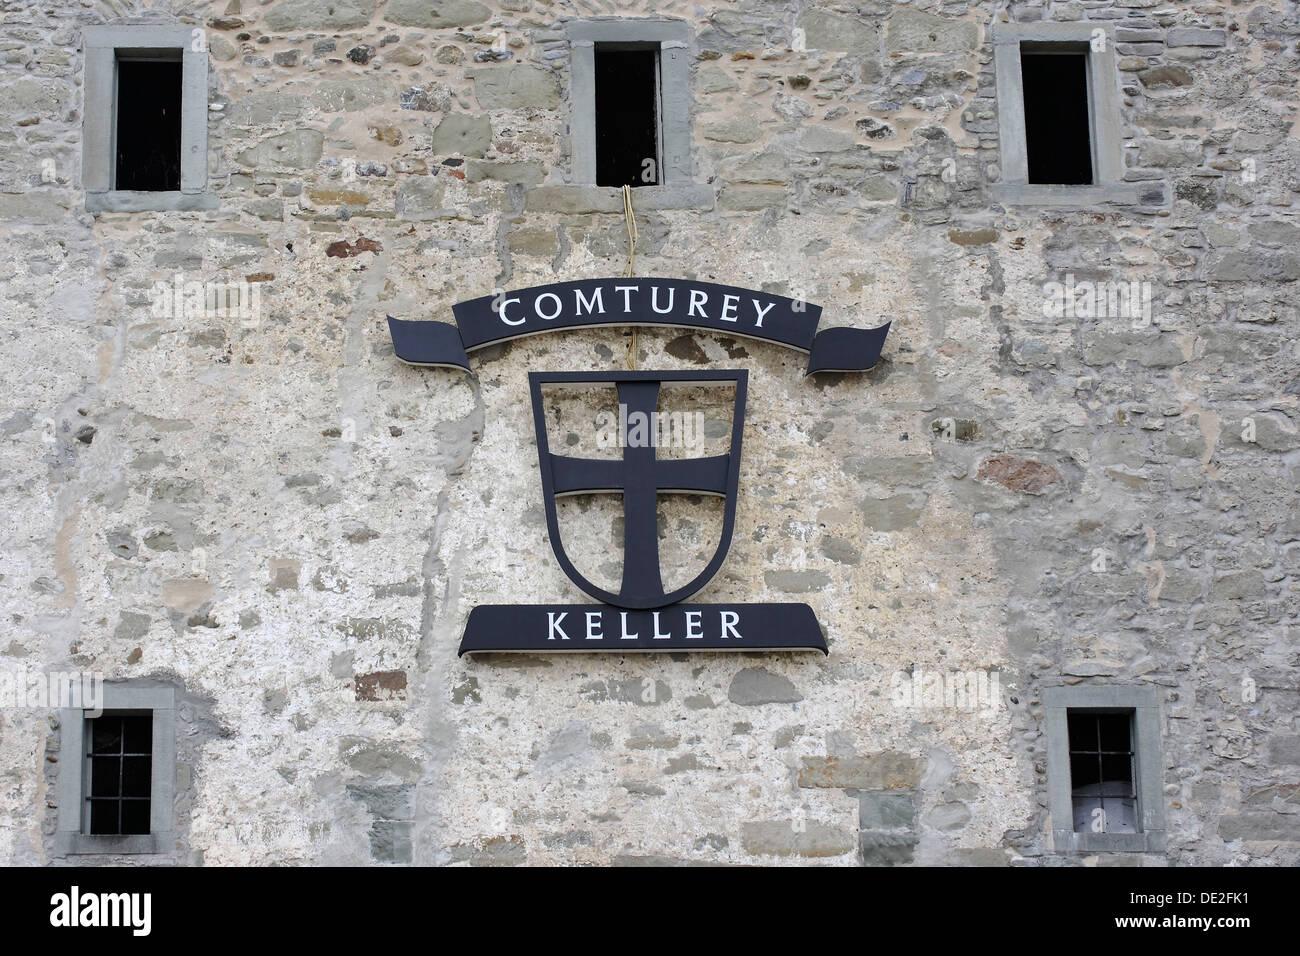 Stonework, Comturey Keller cellar, Mainau Island, Baden-Wuerttemberg, Germany - Stock Image